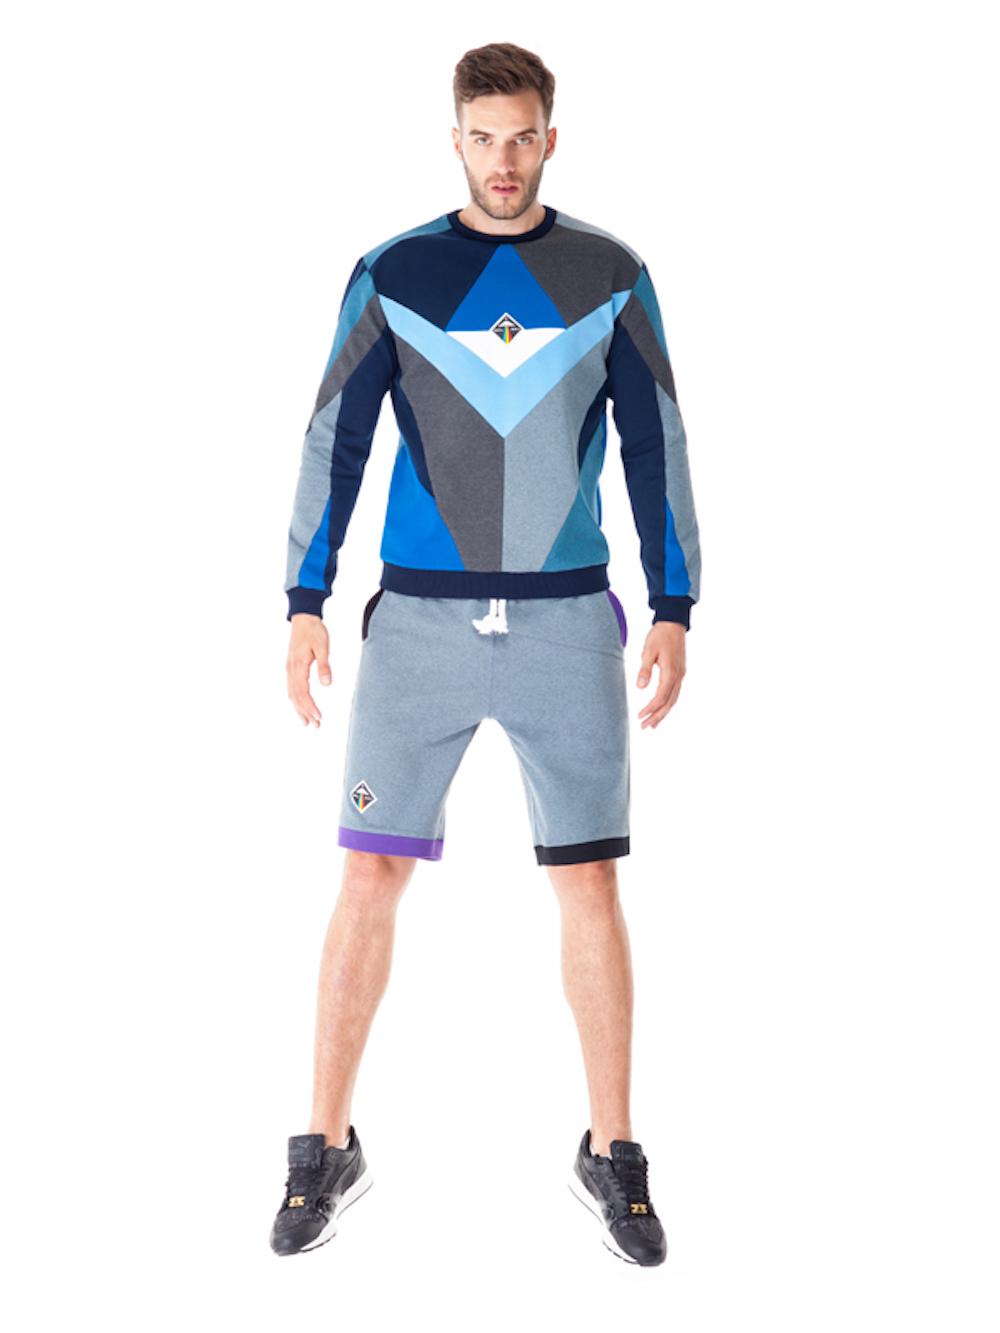 Triangulum Sweatshirt (Blue) - Okuaku